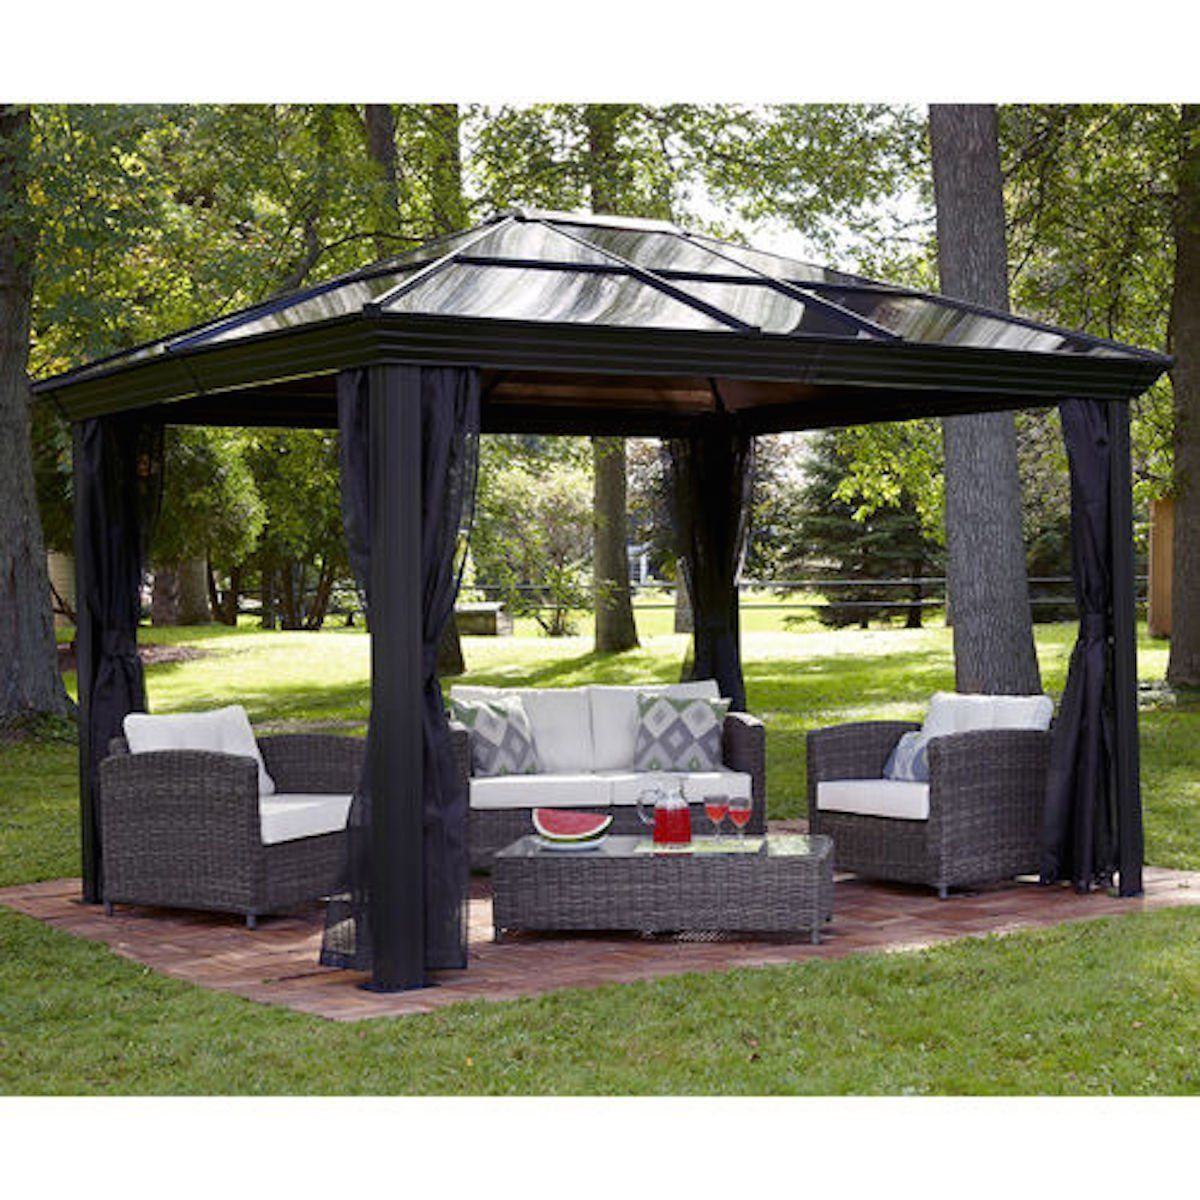 Gazebo Canopy Pergola This 10 X 12 Hardtop Gazebo Tent Has A